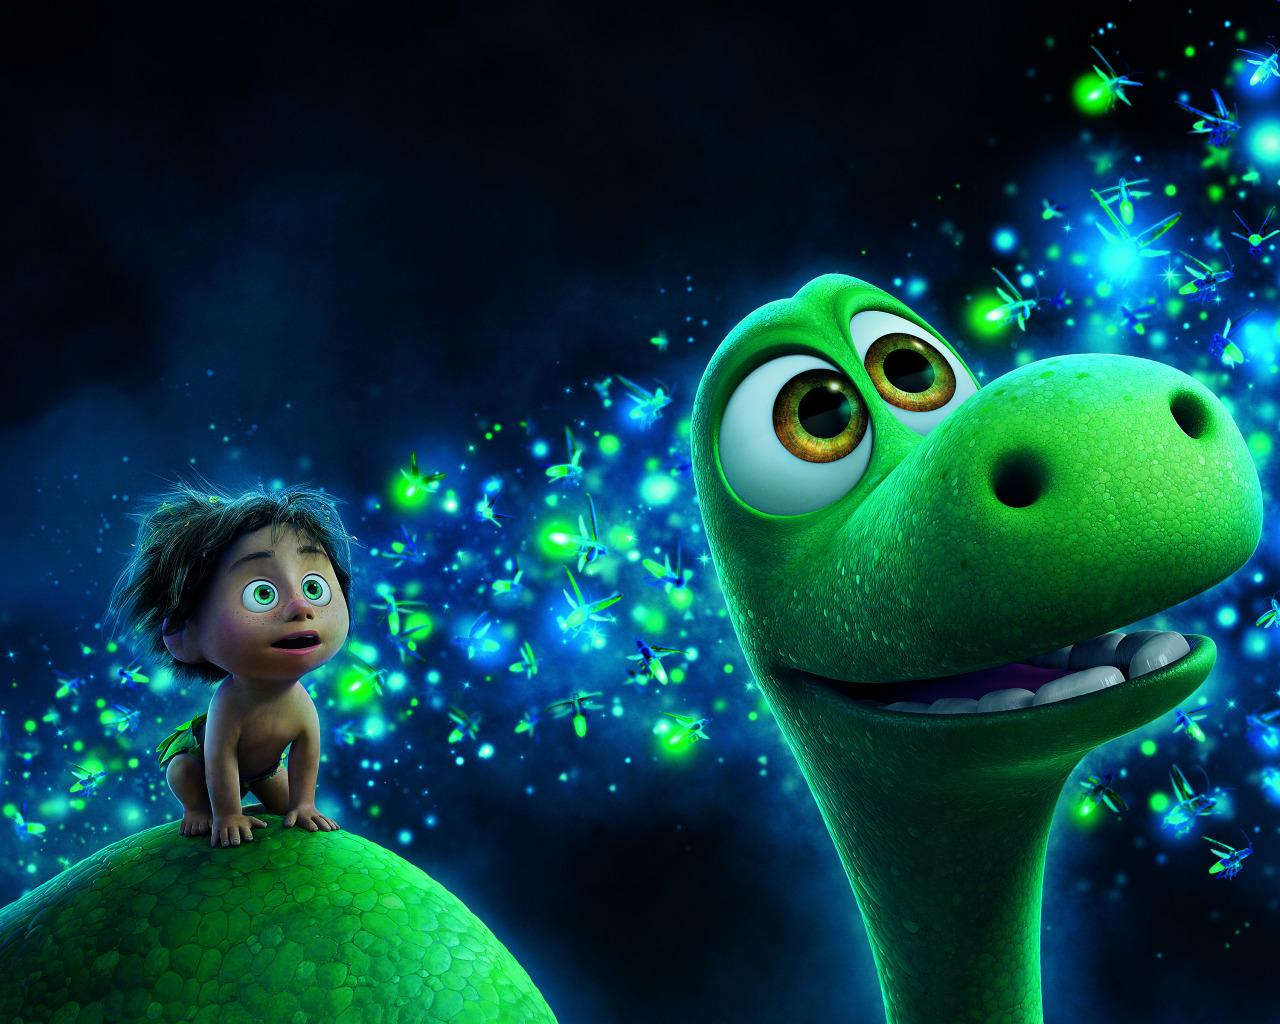 pixar background